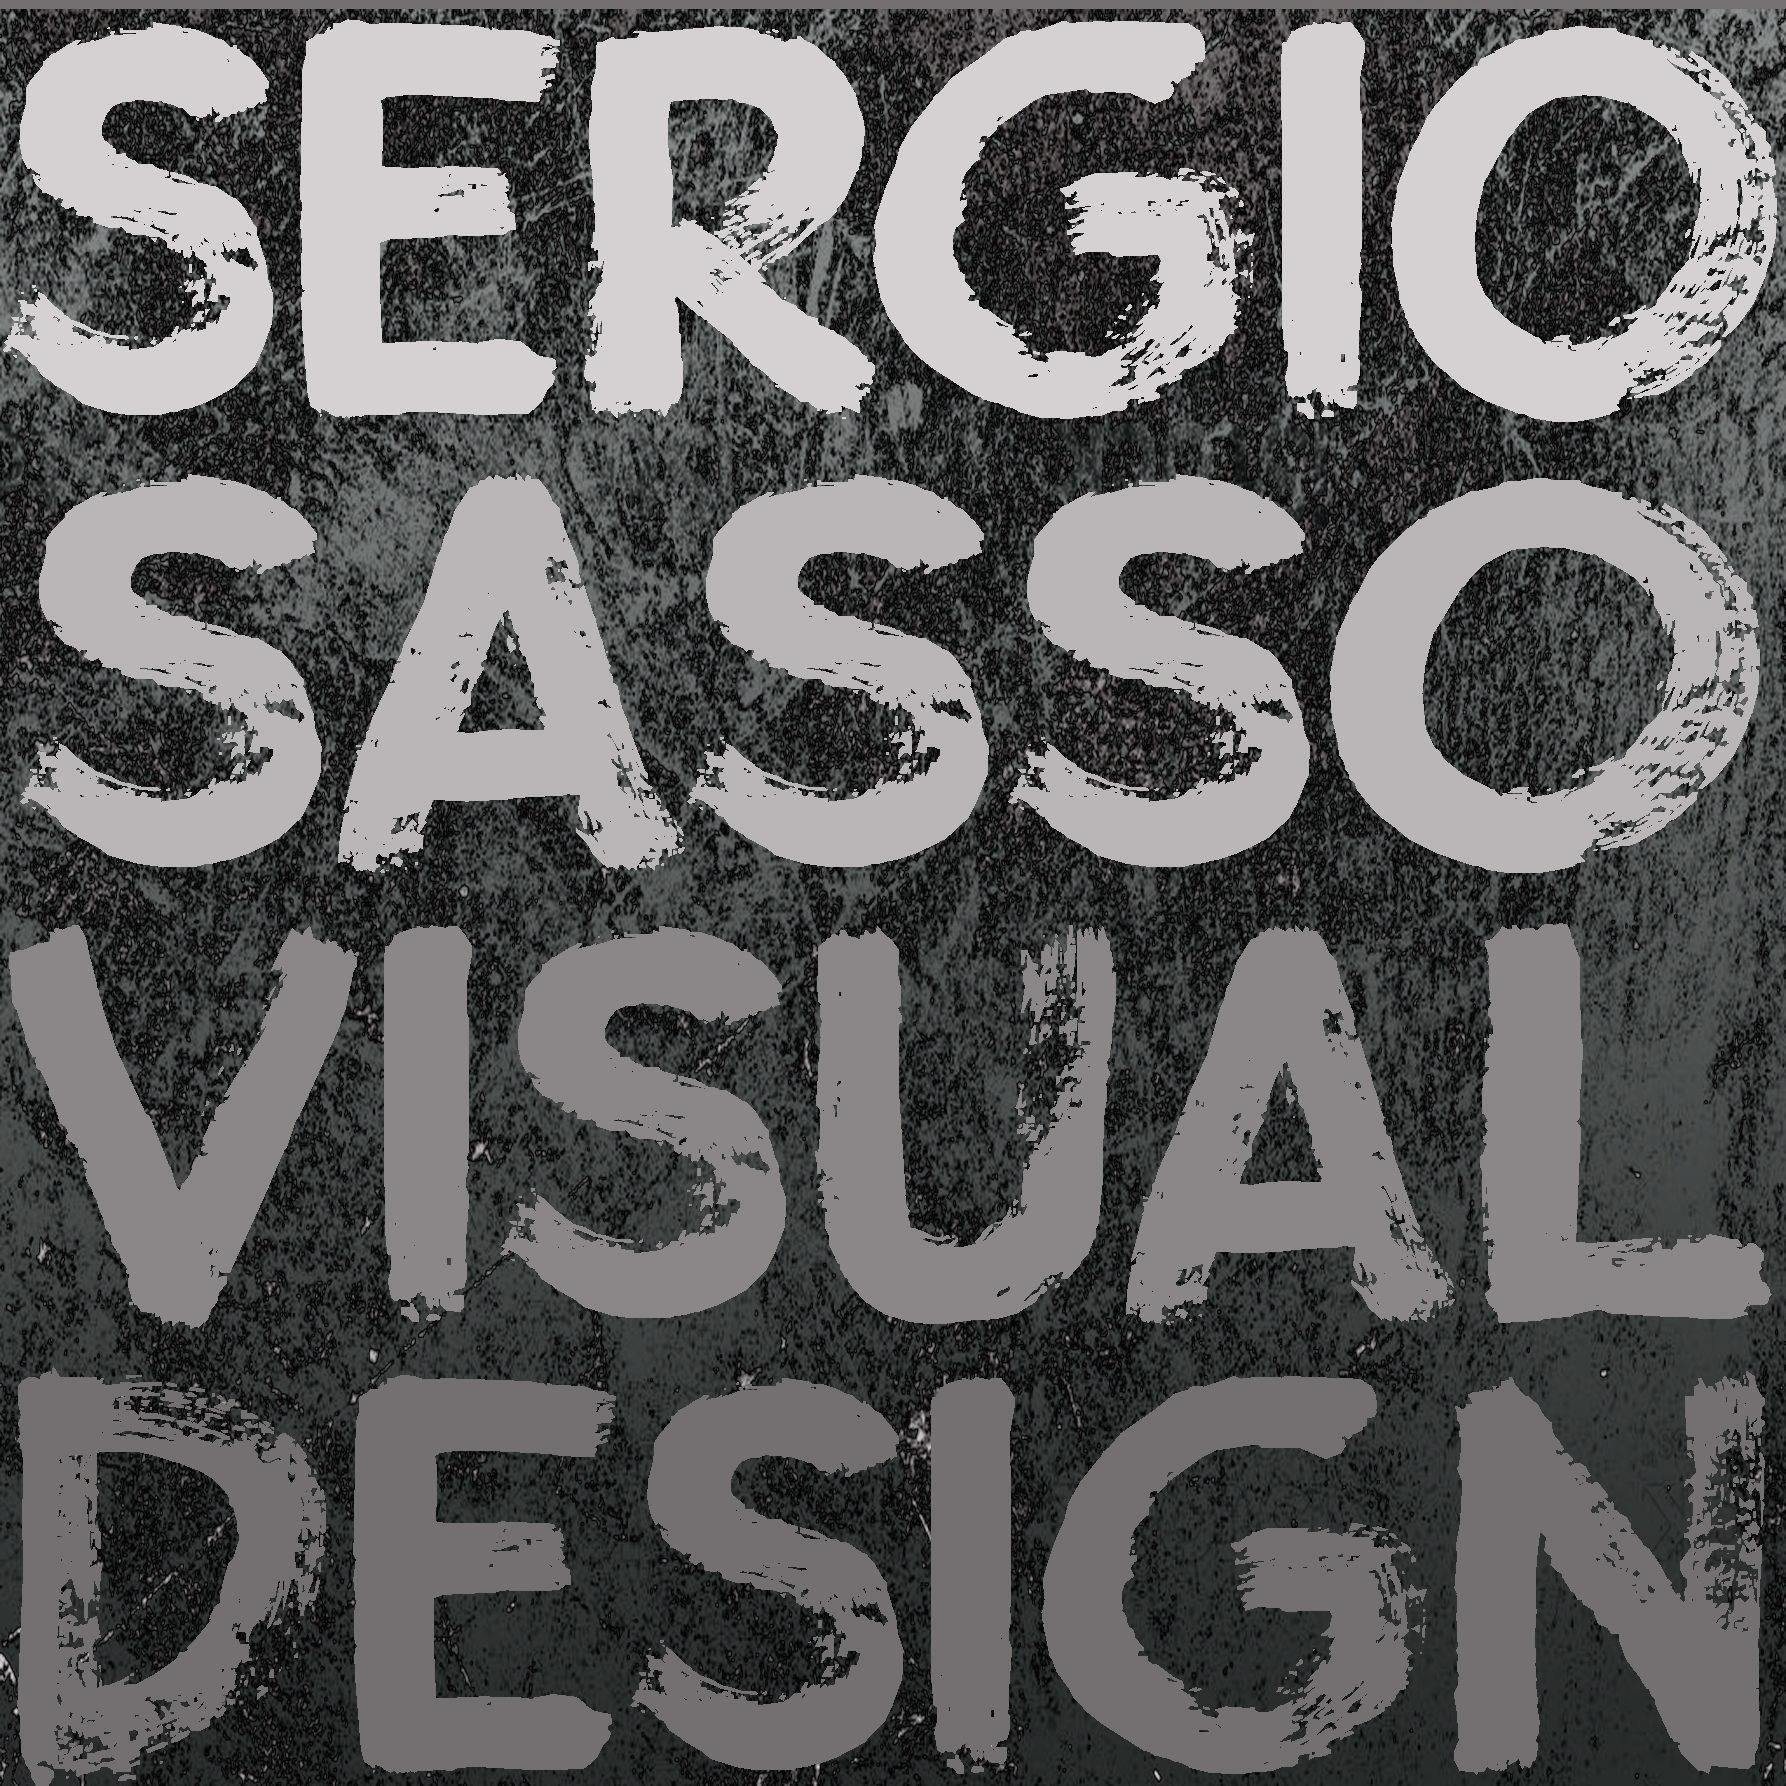 Sergio Sasso